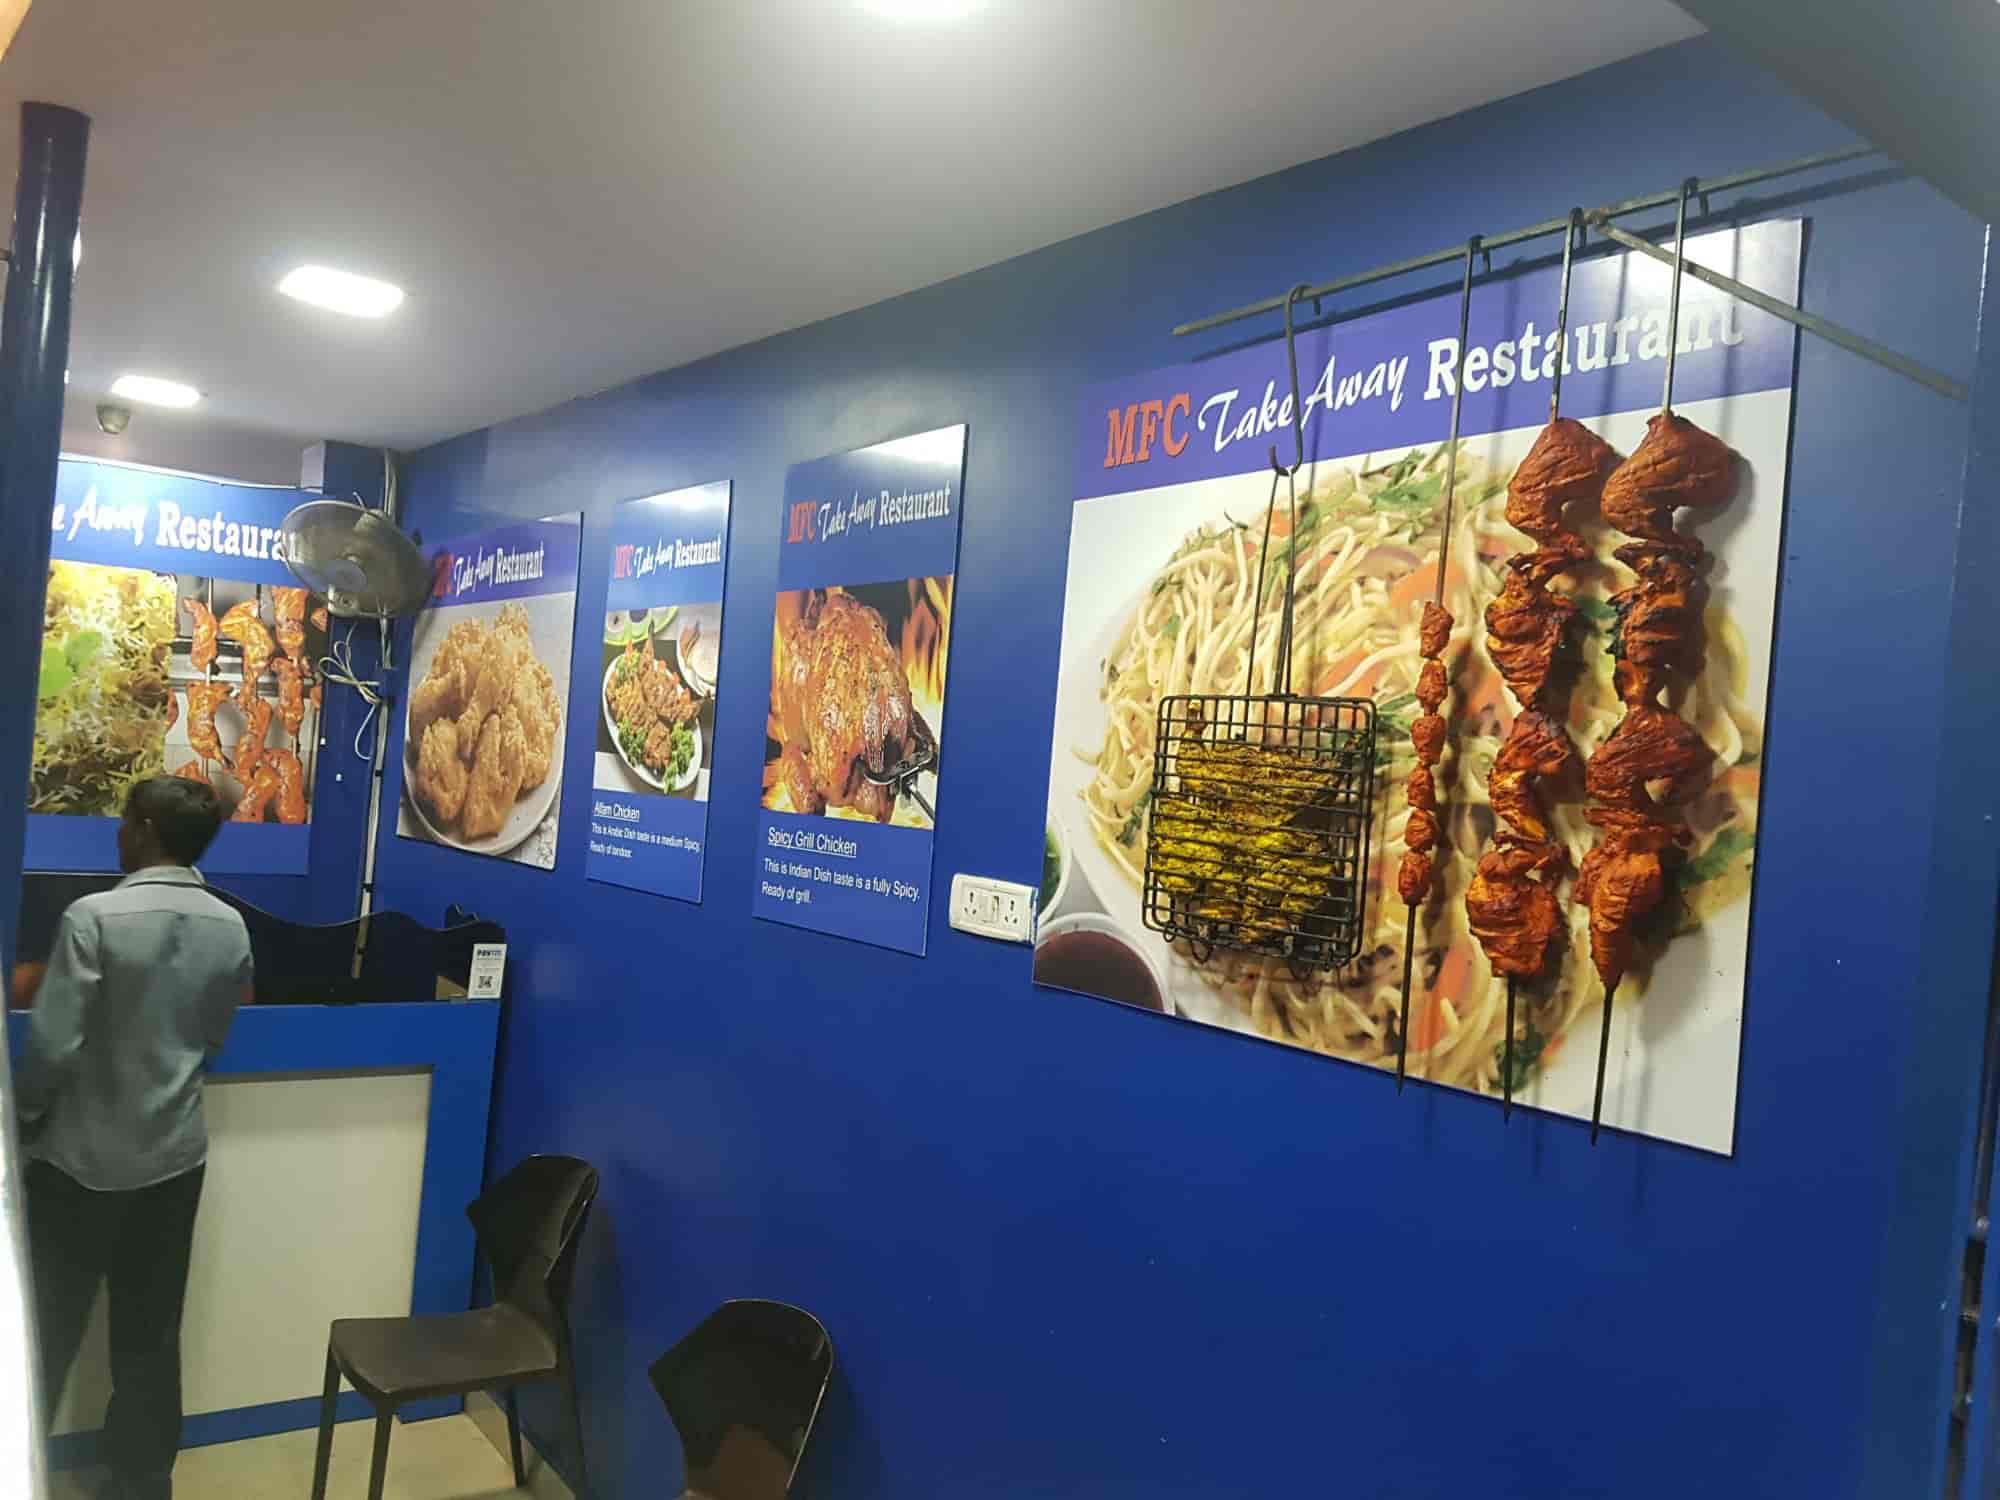 Mfc Take Away And Restaurant Photos Santa Cruz Goa Pictures